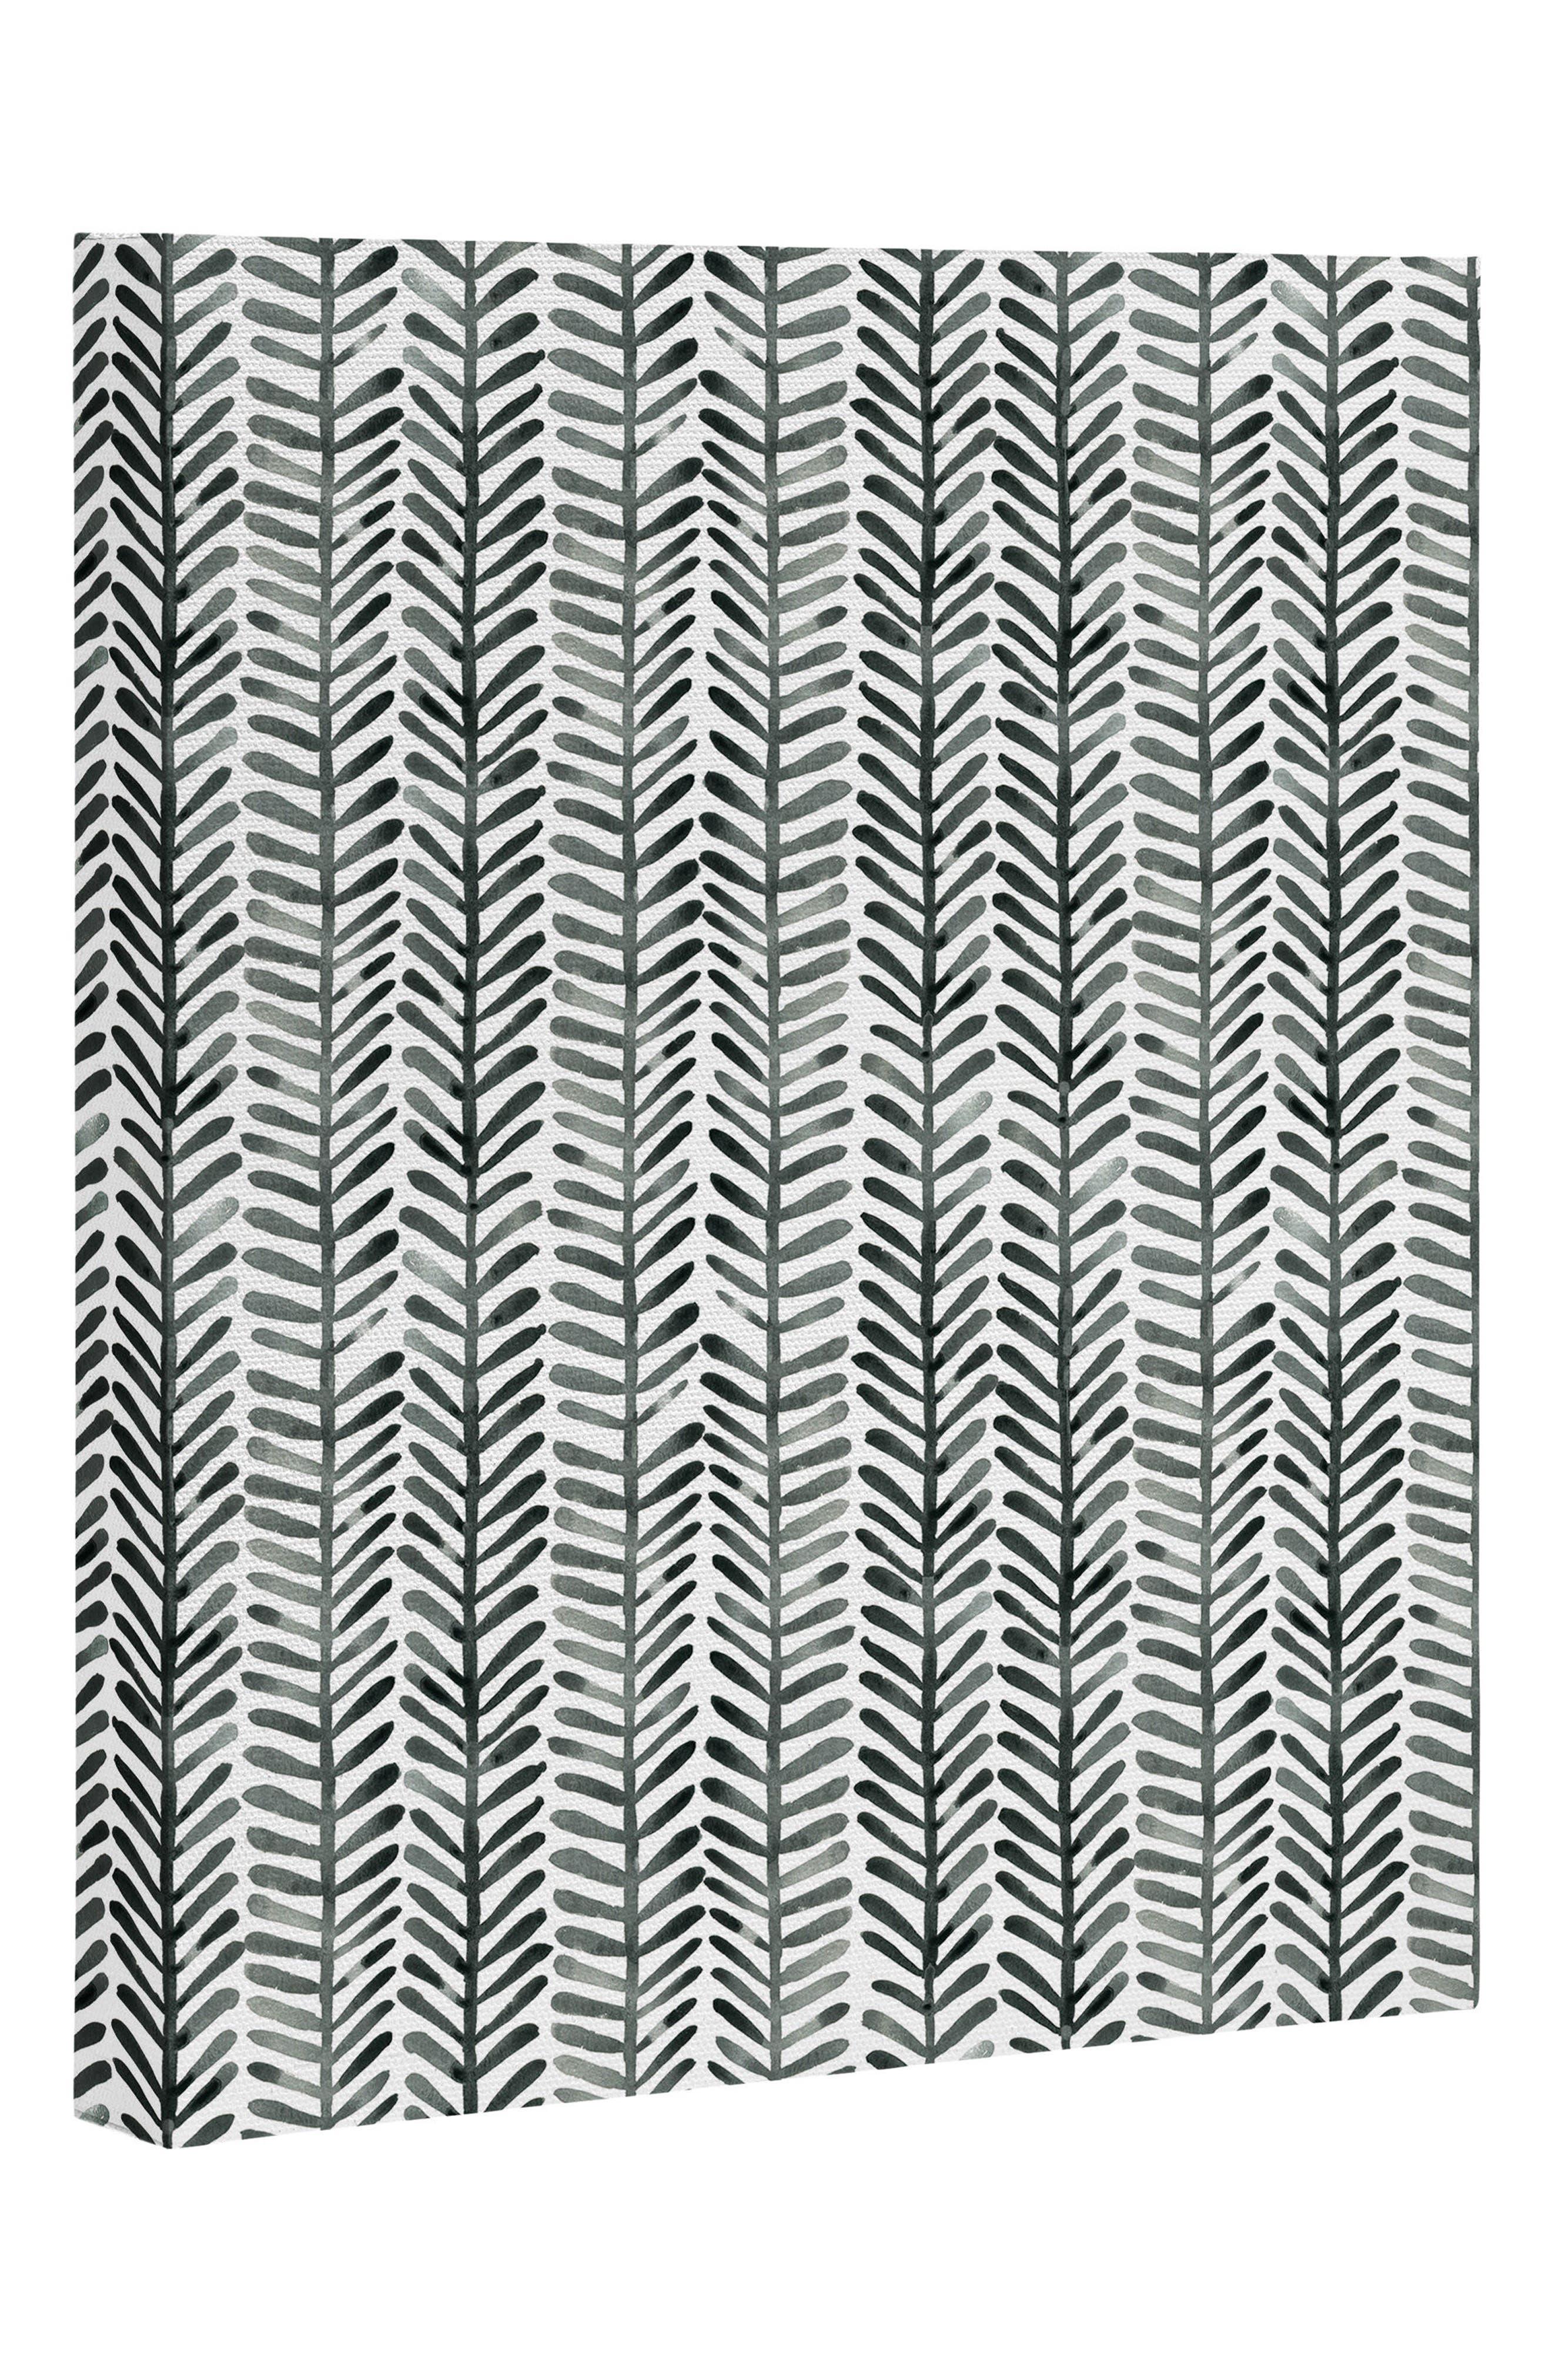 Alternate Image 1 Selected - Deny Designs Herring Canvas Print